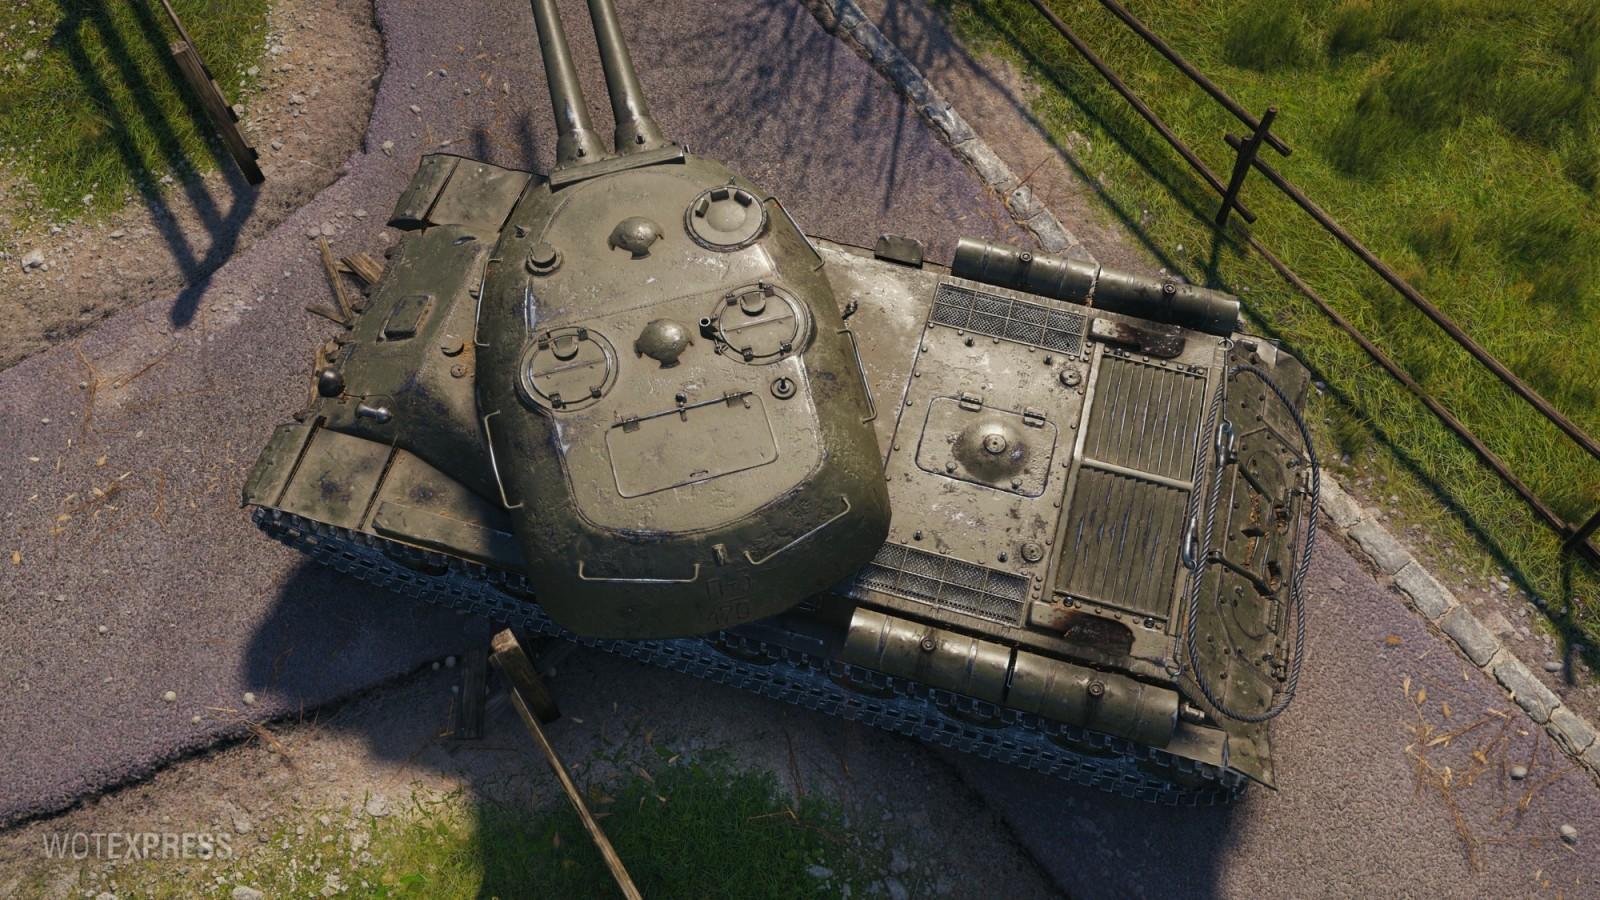 башня танка картинки вечеринки британские колледжи